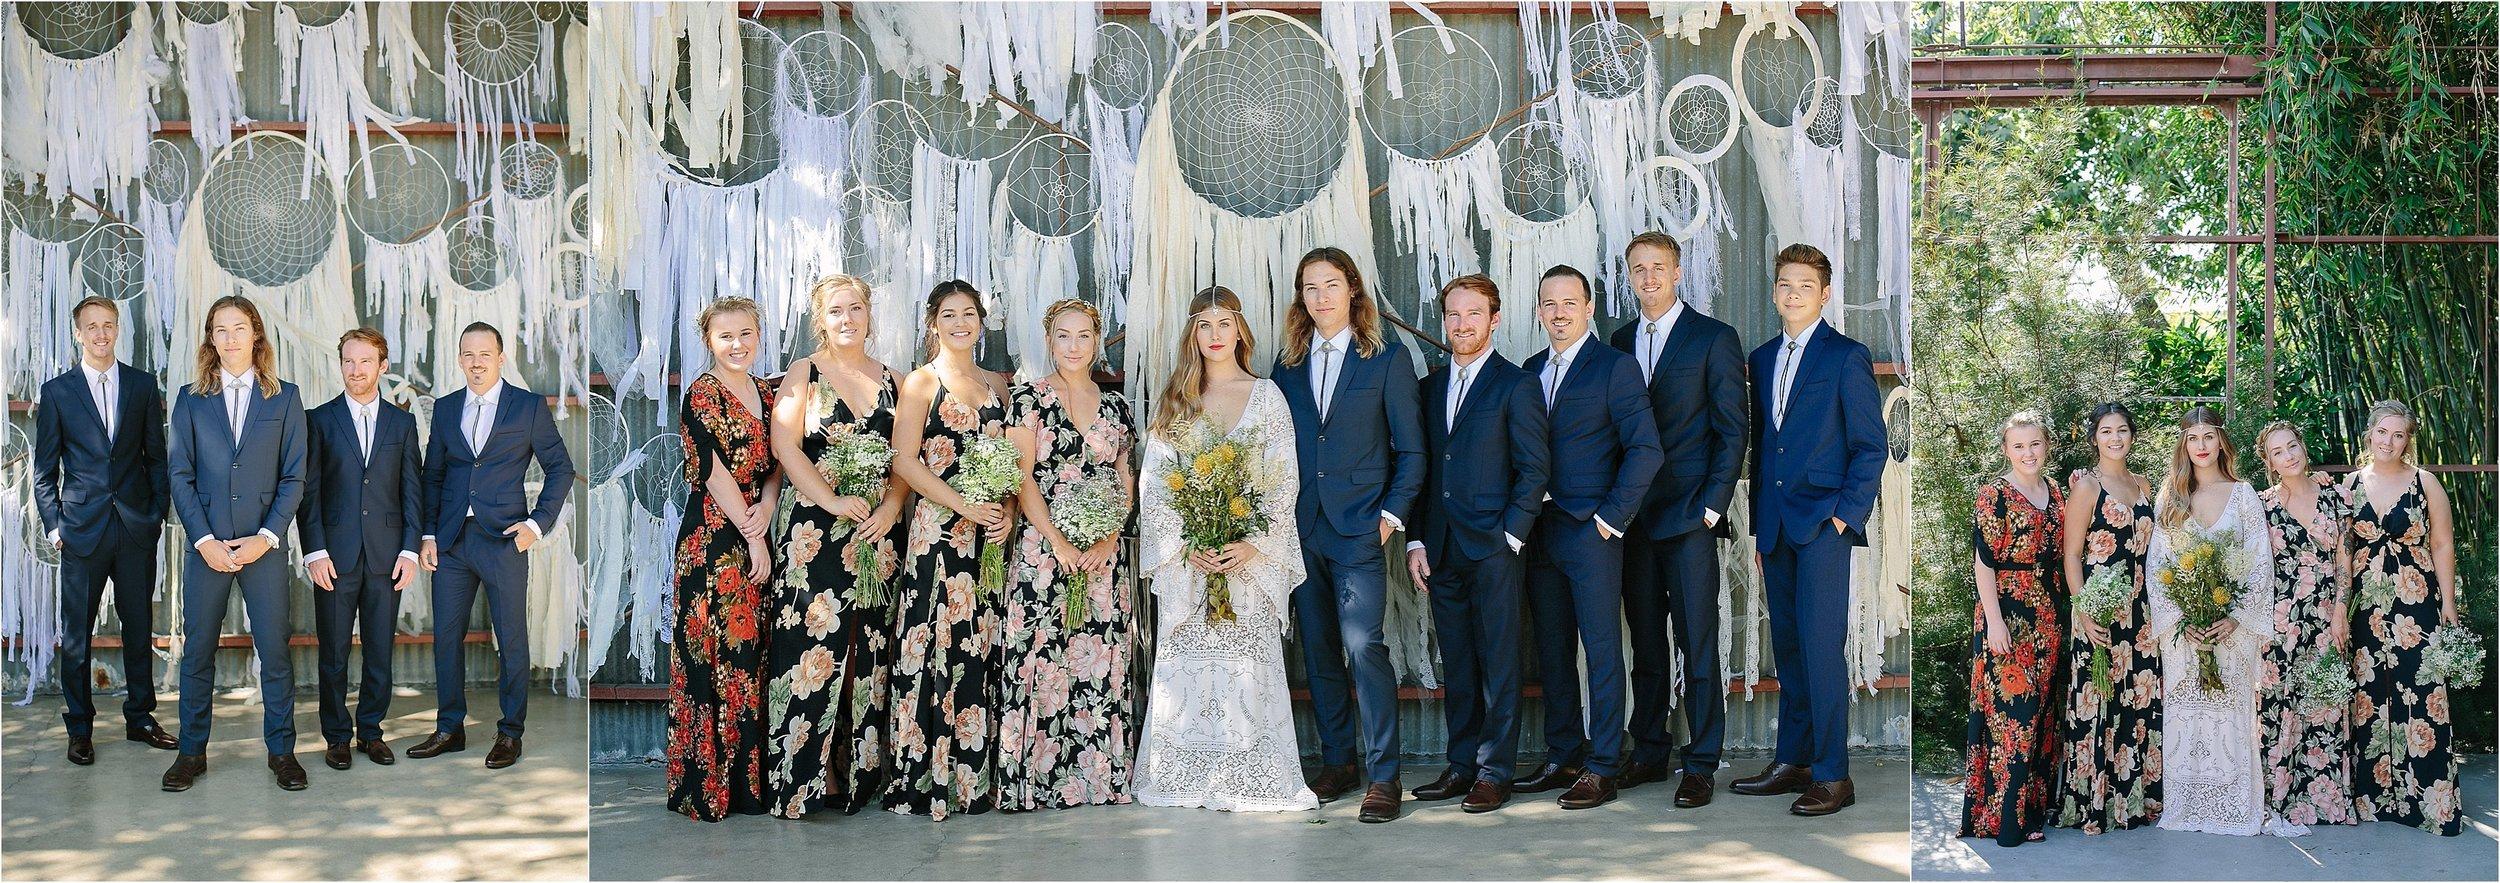 Boho Bridesmaids & Groomsmen Photo